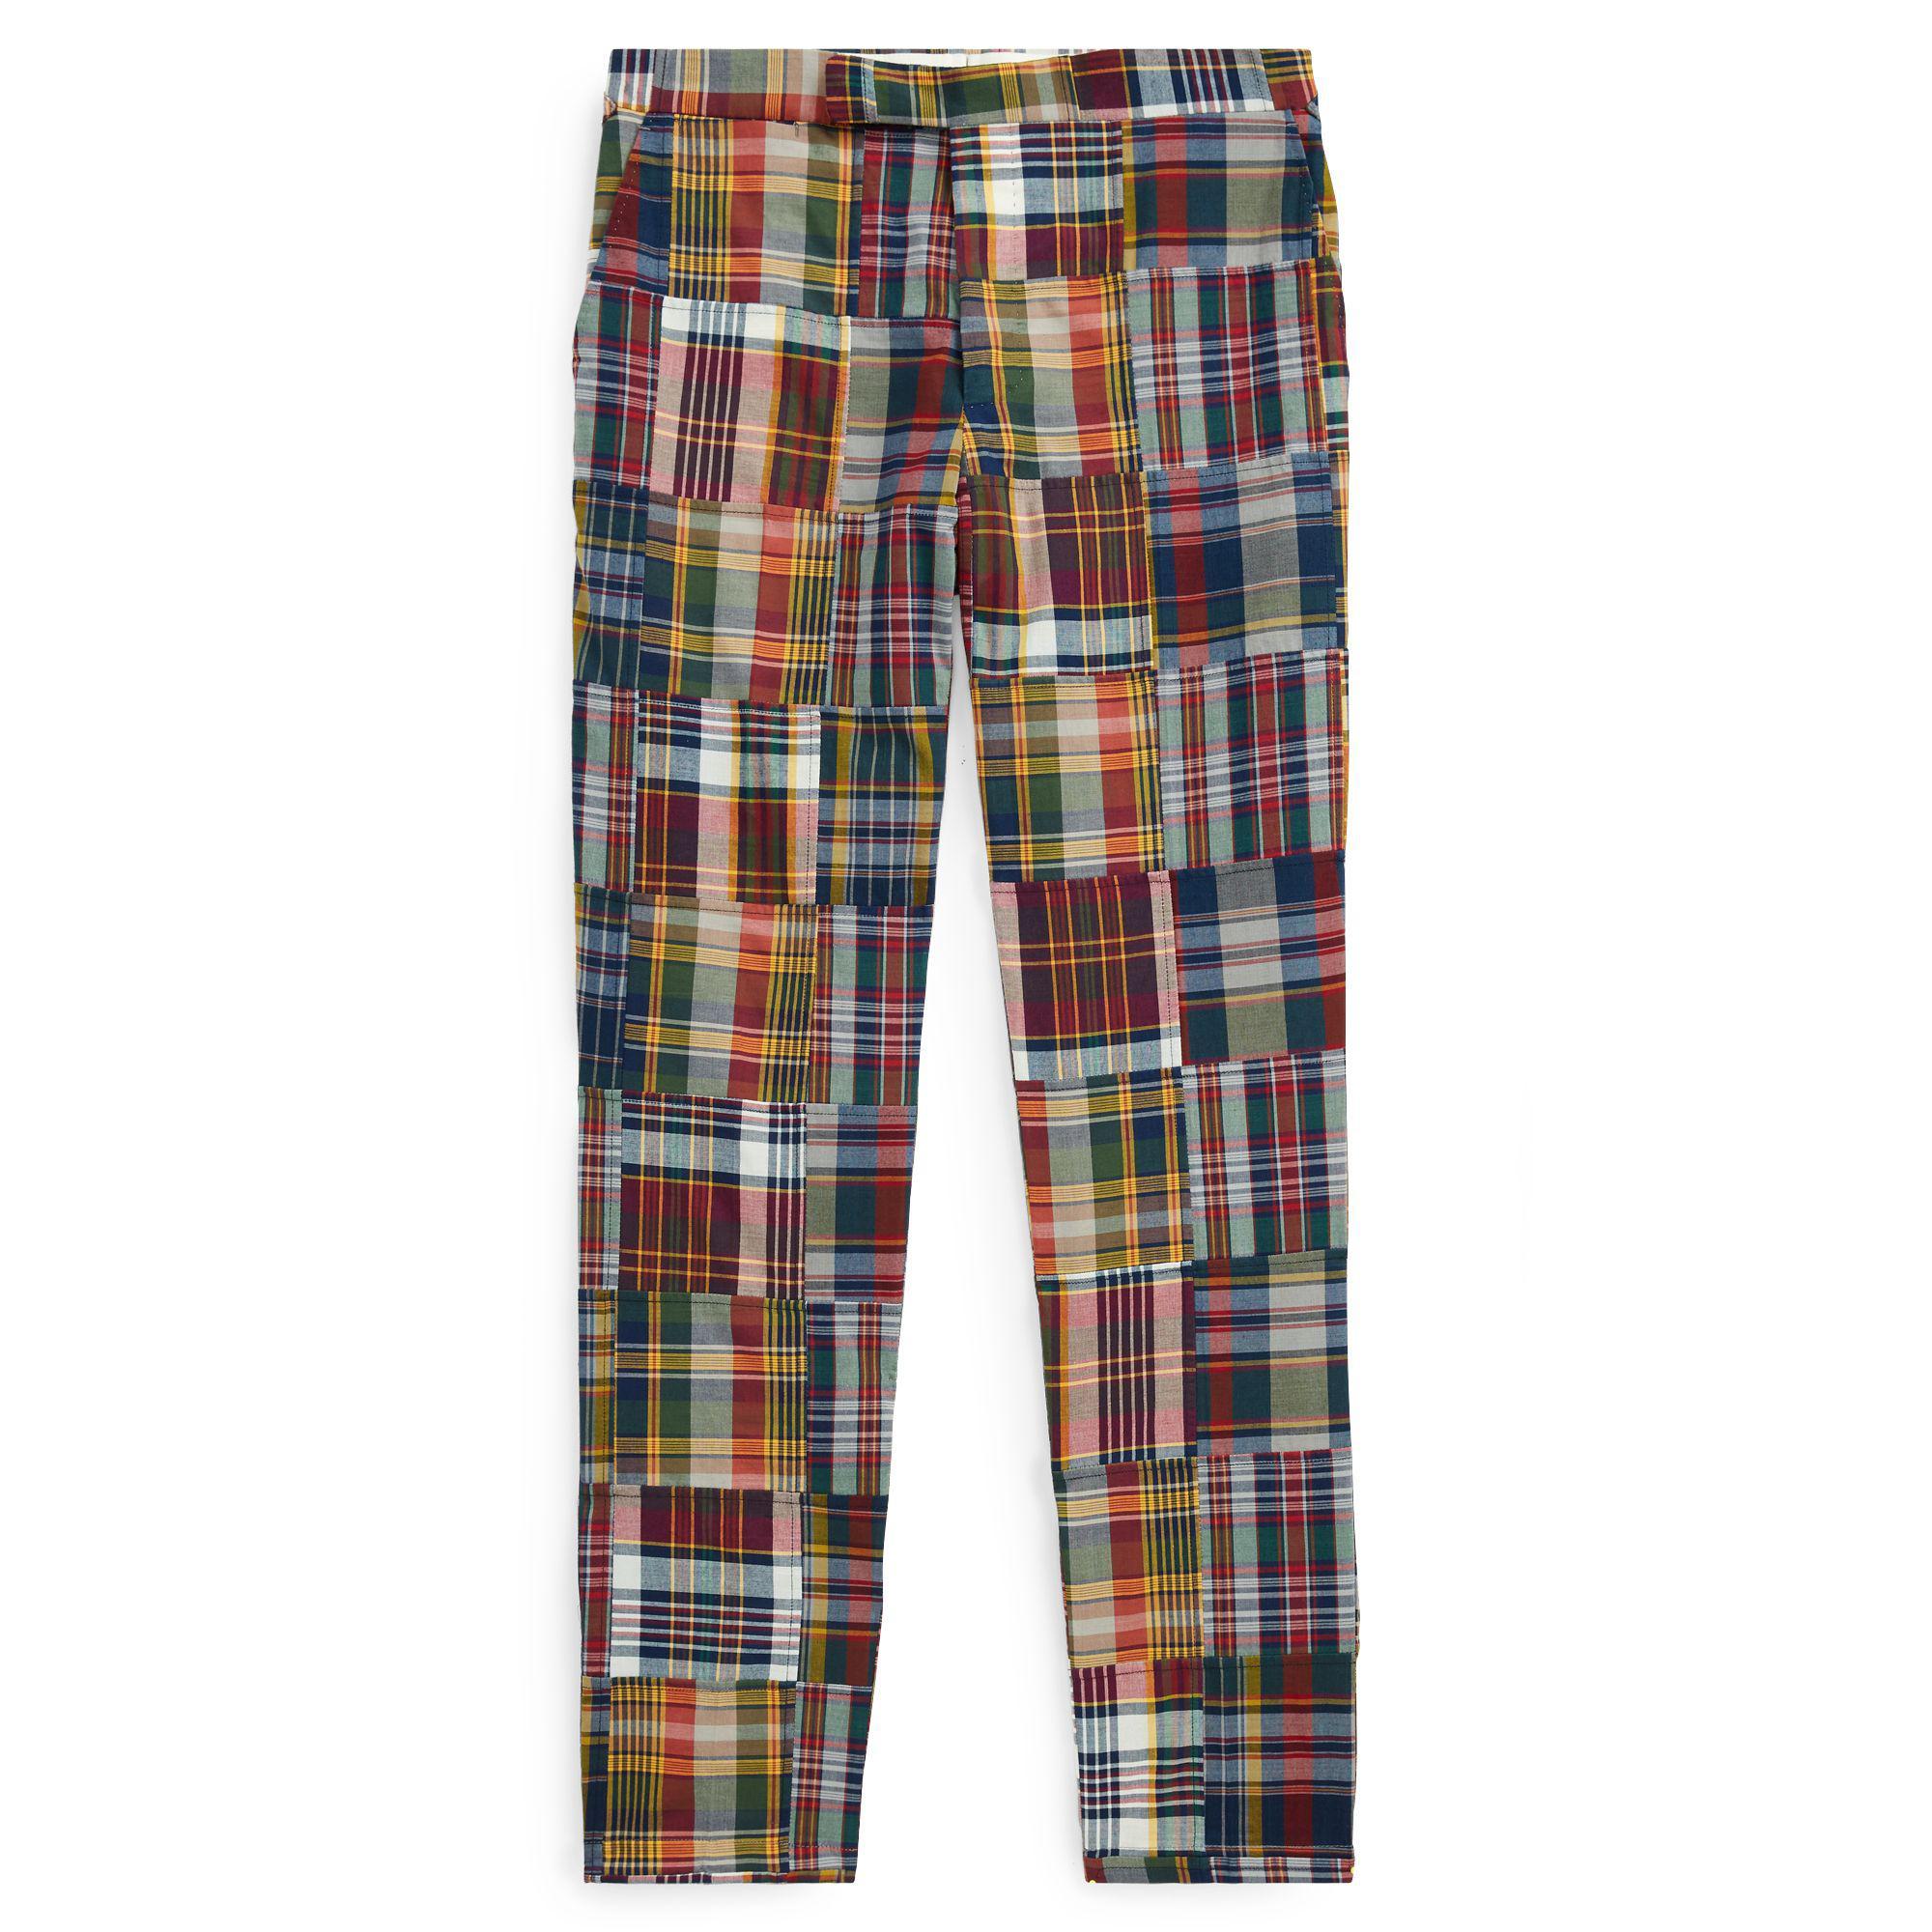 5c615fef9fec Polo Ralph Lauren Polo Patchwork Madras Trouser for Men - Lyst